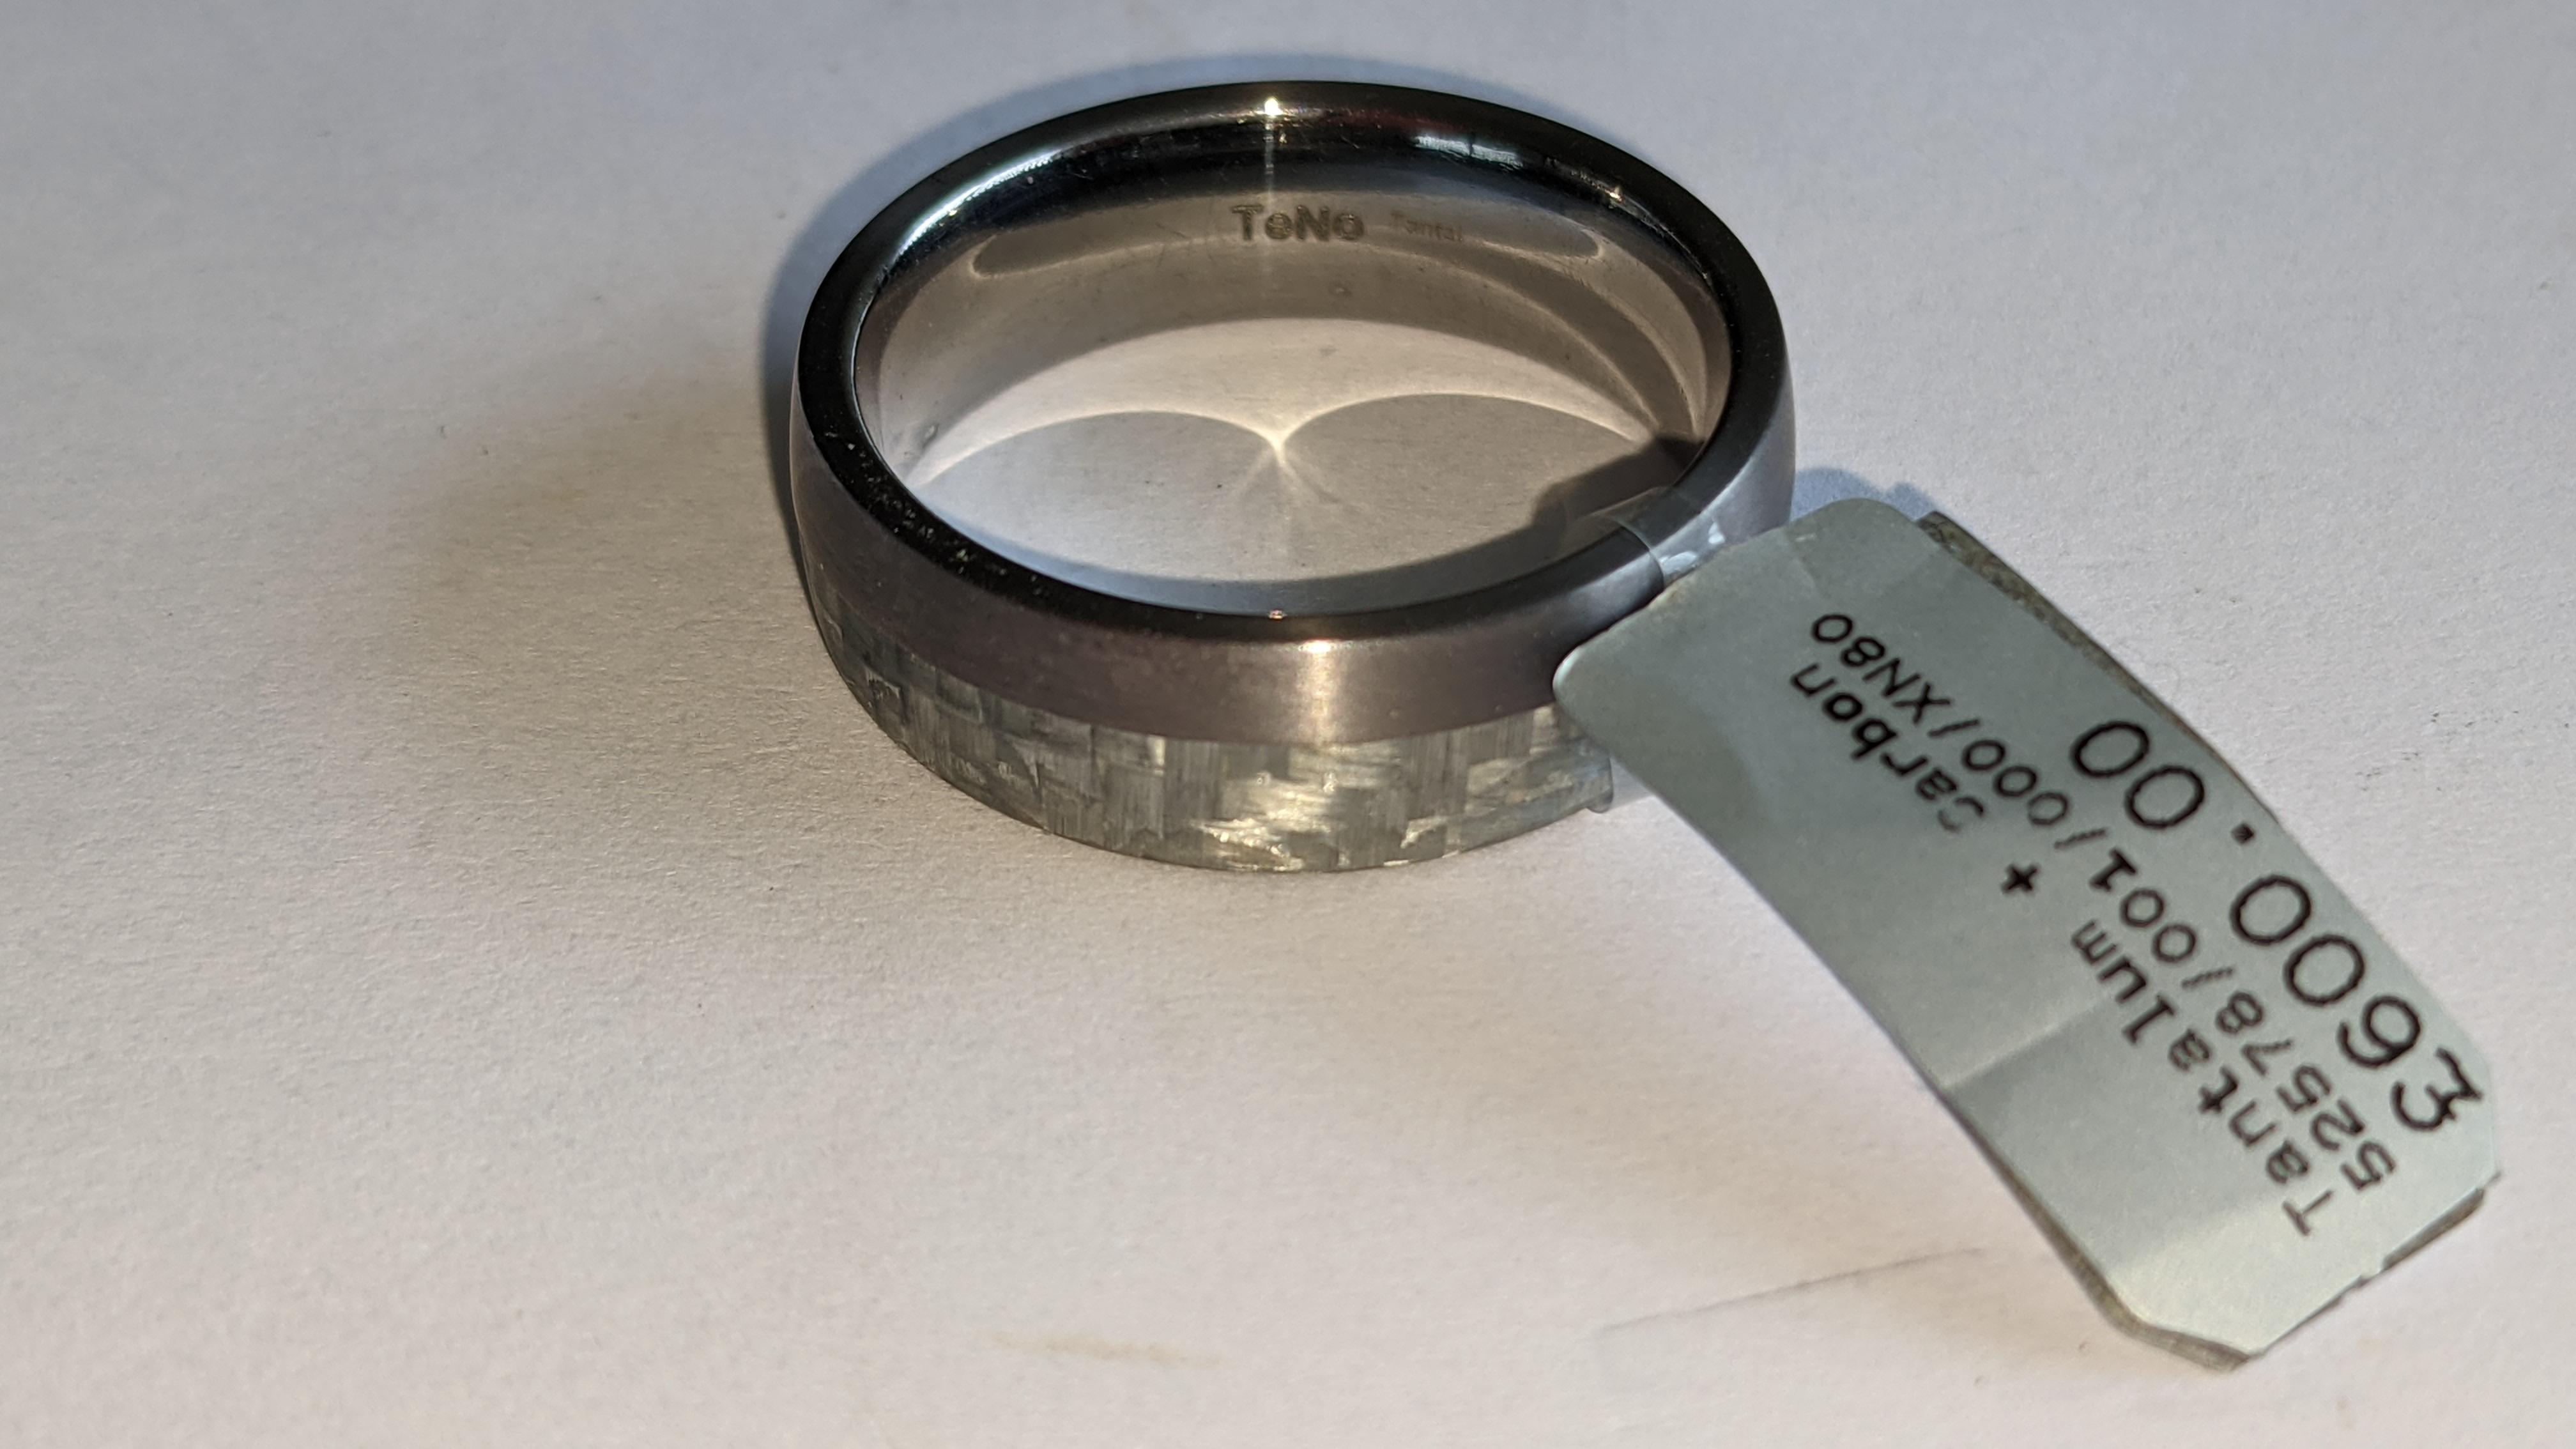 Tantalum & carbon ring RRP £600 - Image 5 of 13